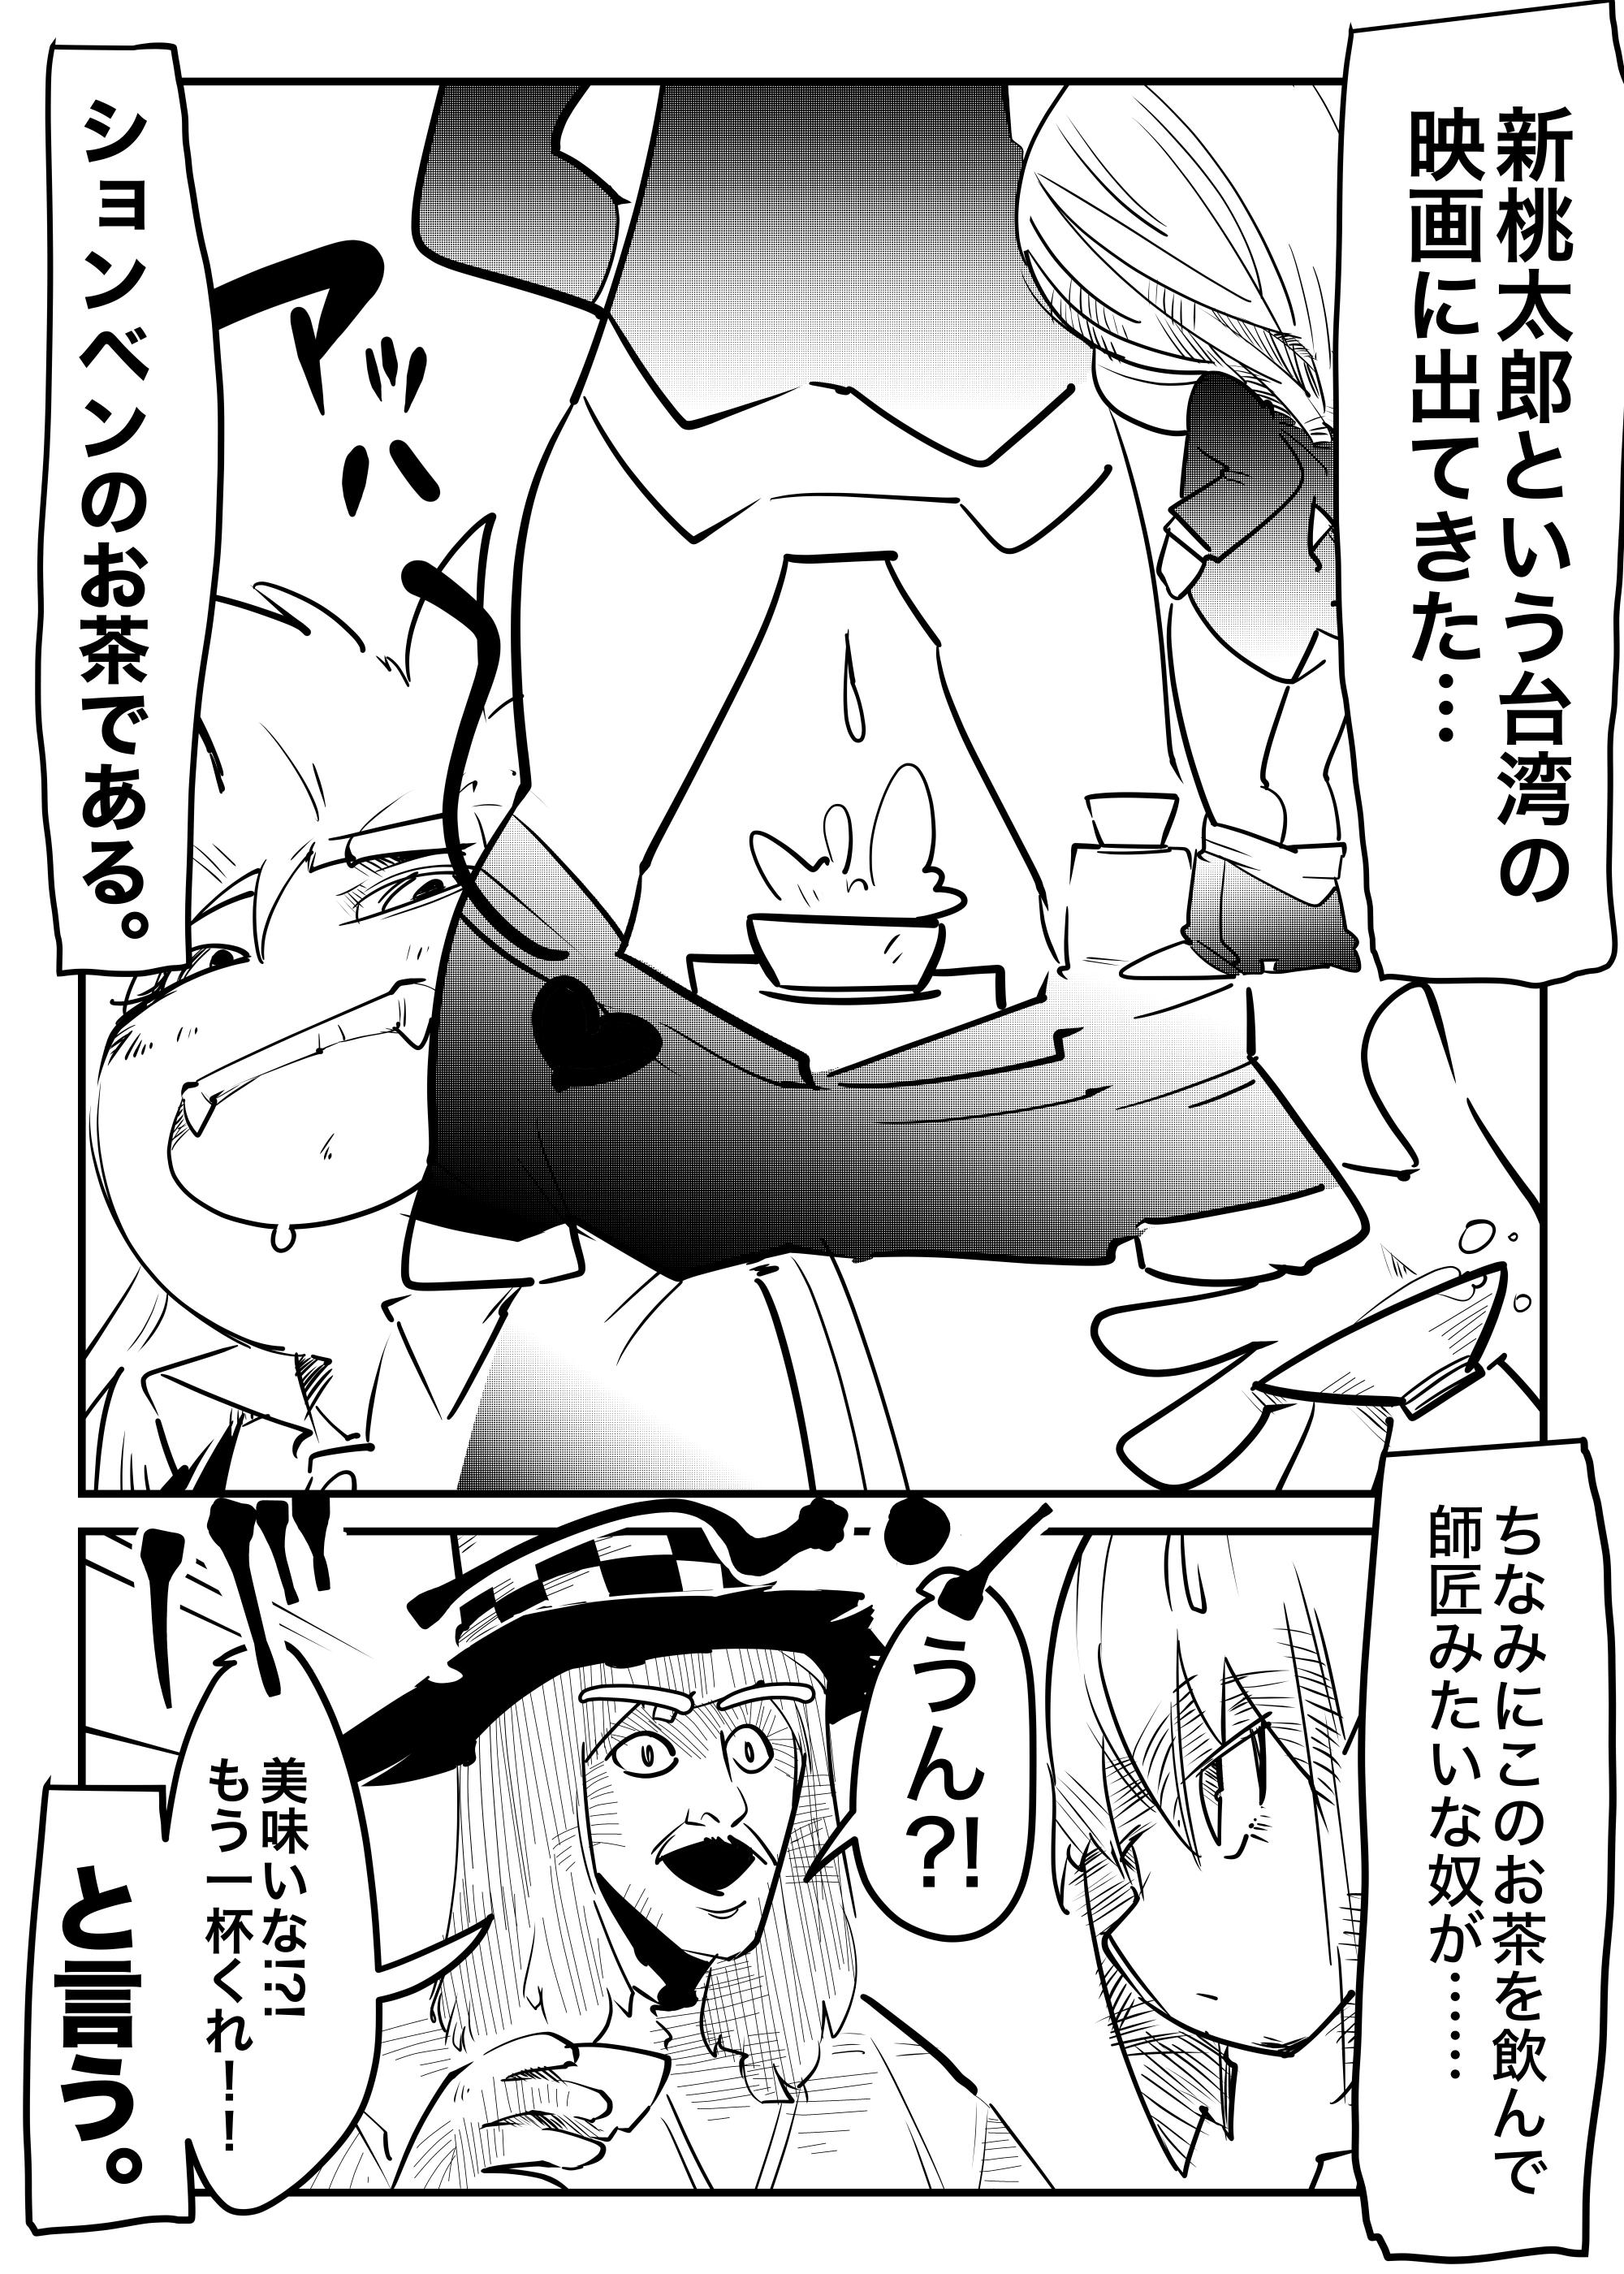 f:id:terashimaru117:20210915164912p:plain